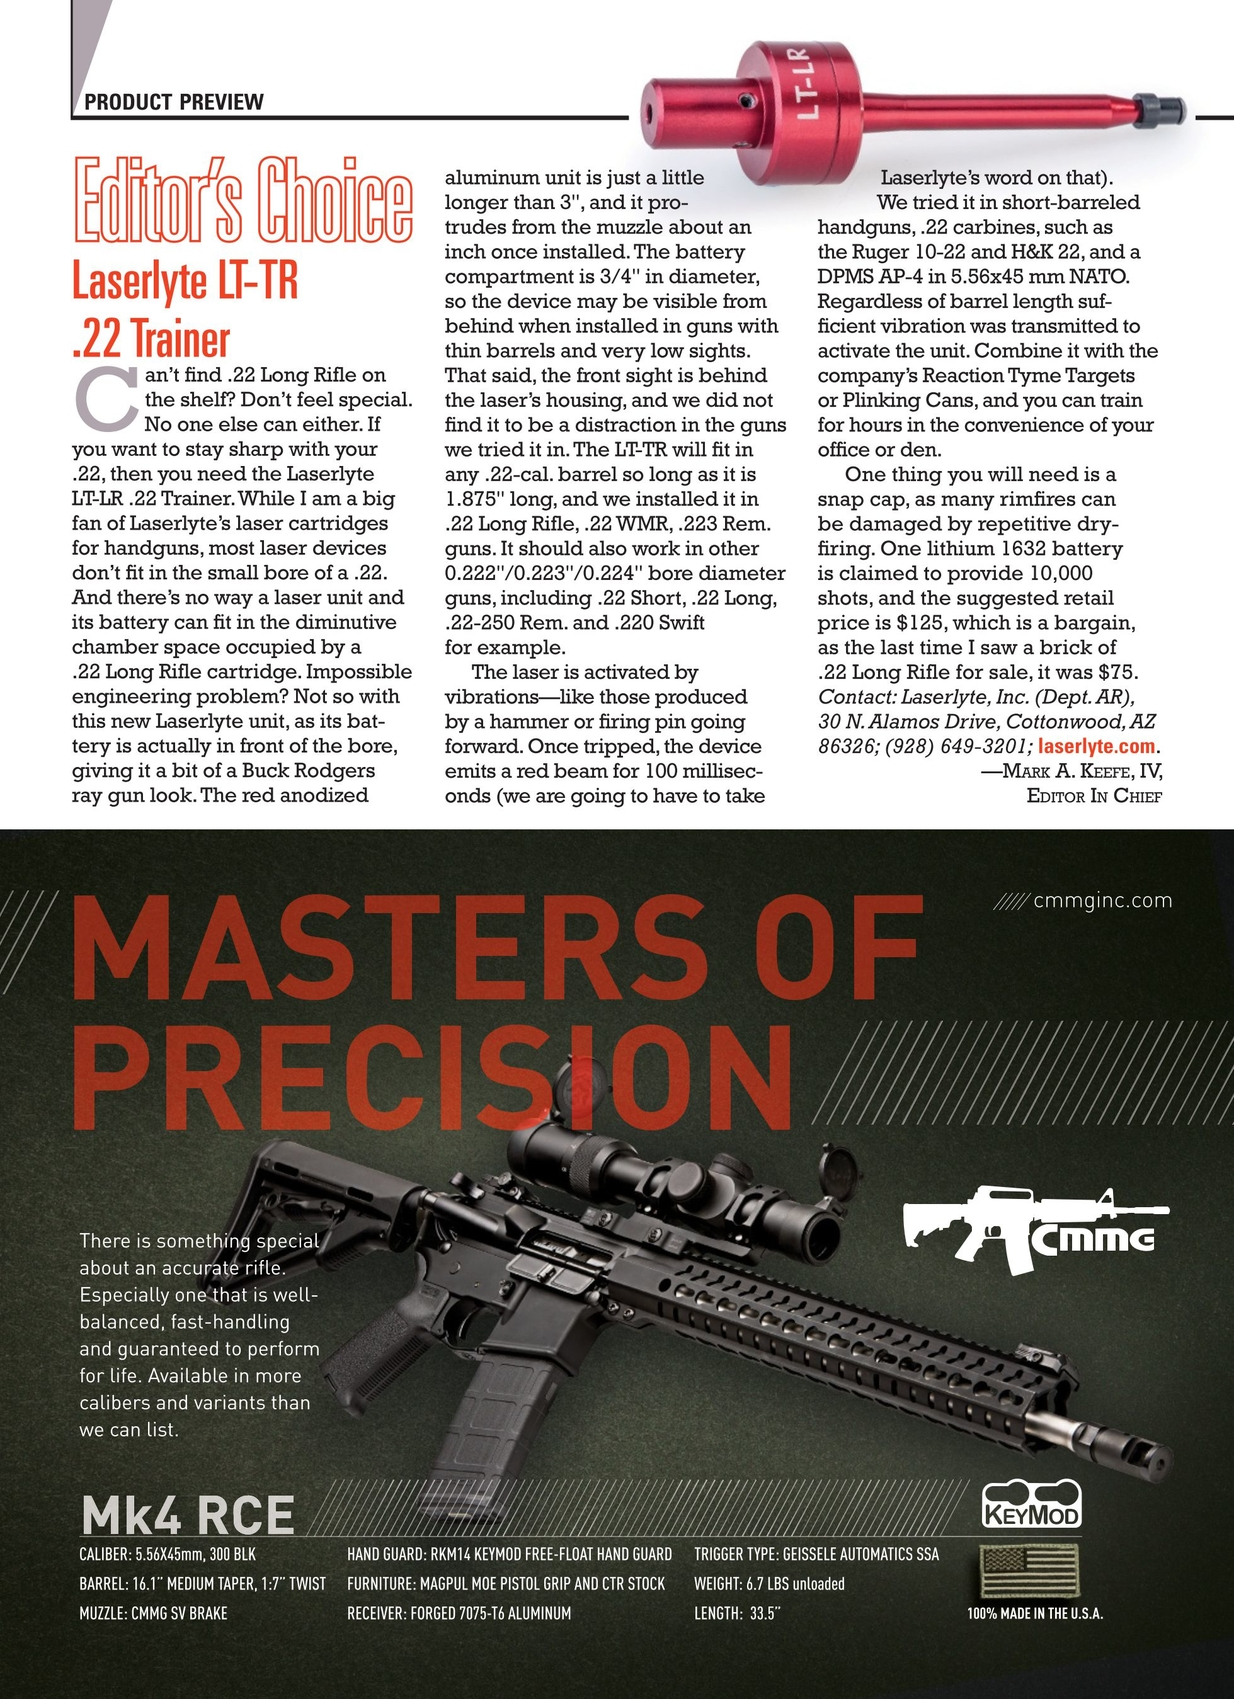 American Rifleman - September 2014